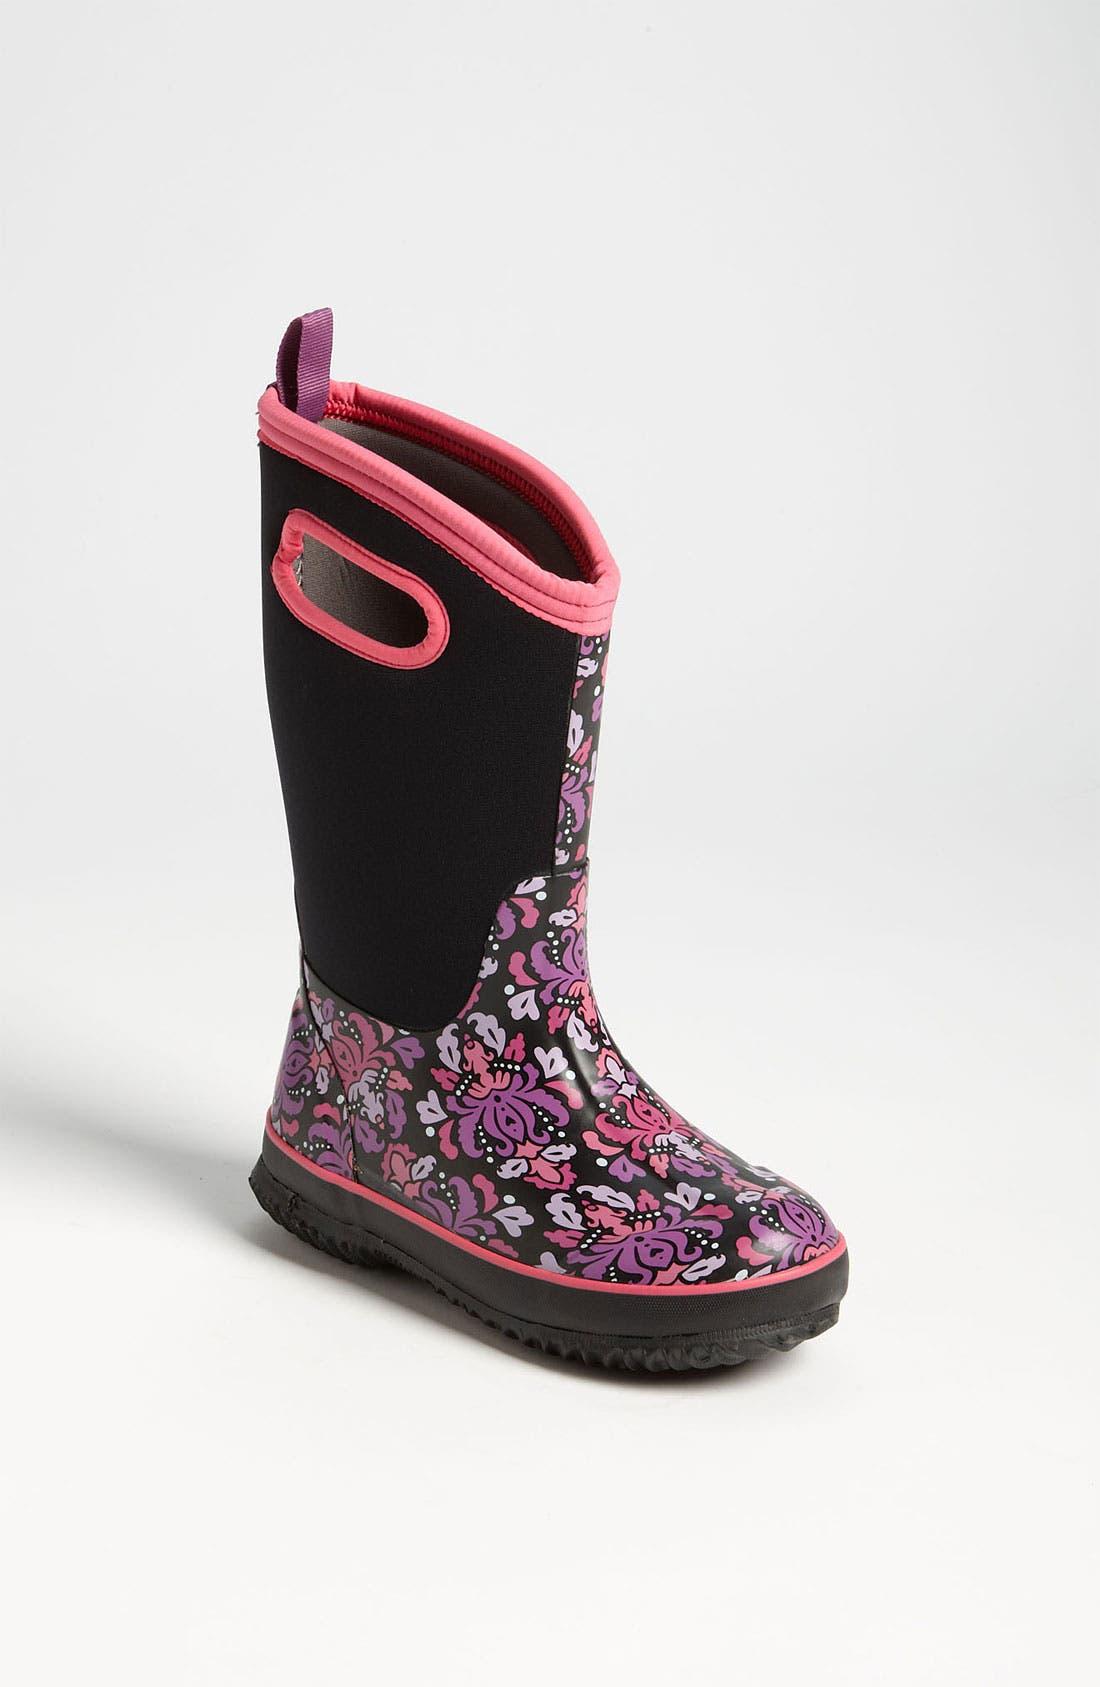 Main Image - Bogs 'Classic High - Fleur' Waterproof Boot (Toddler, Little Kid & Big Kid) (Nordstrom Exclusive)